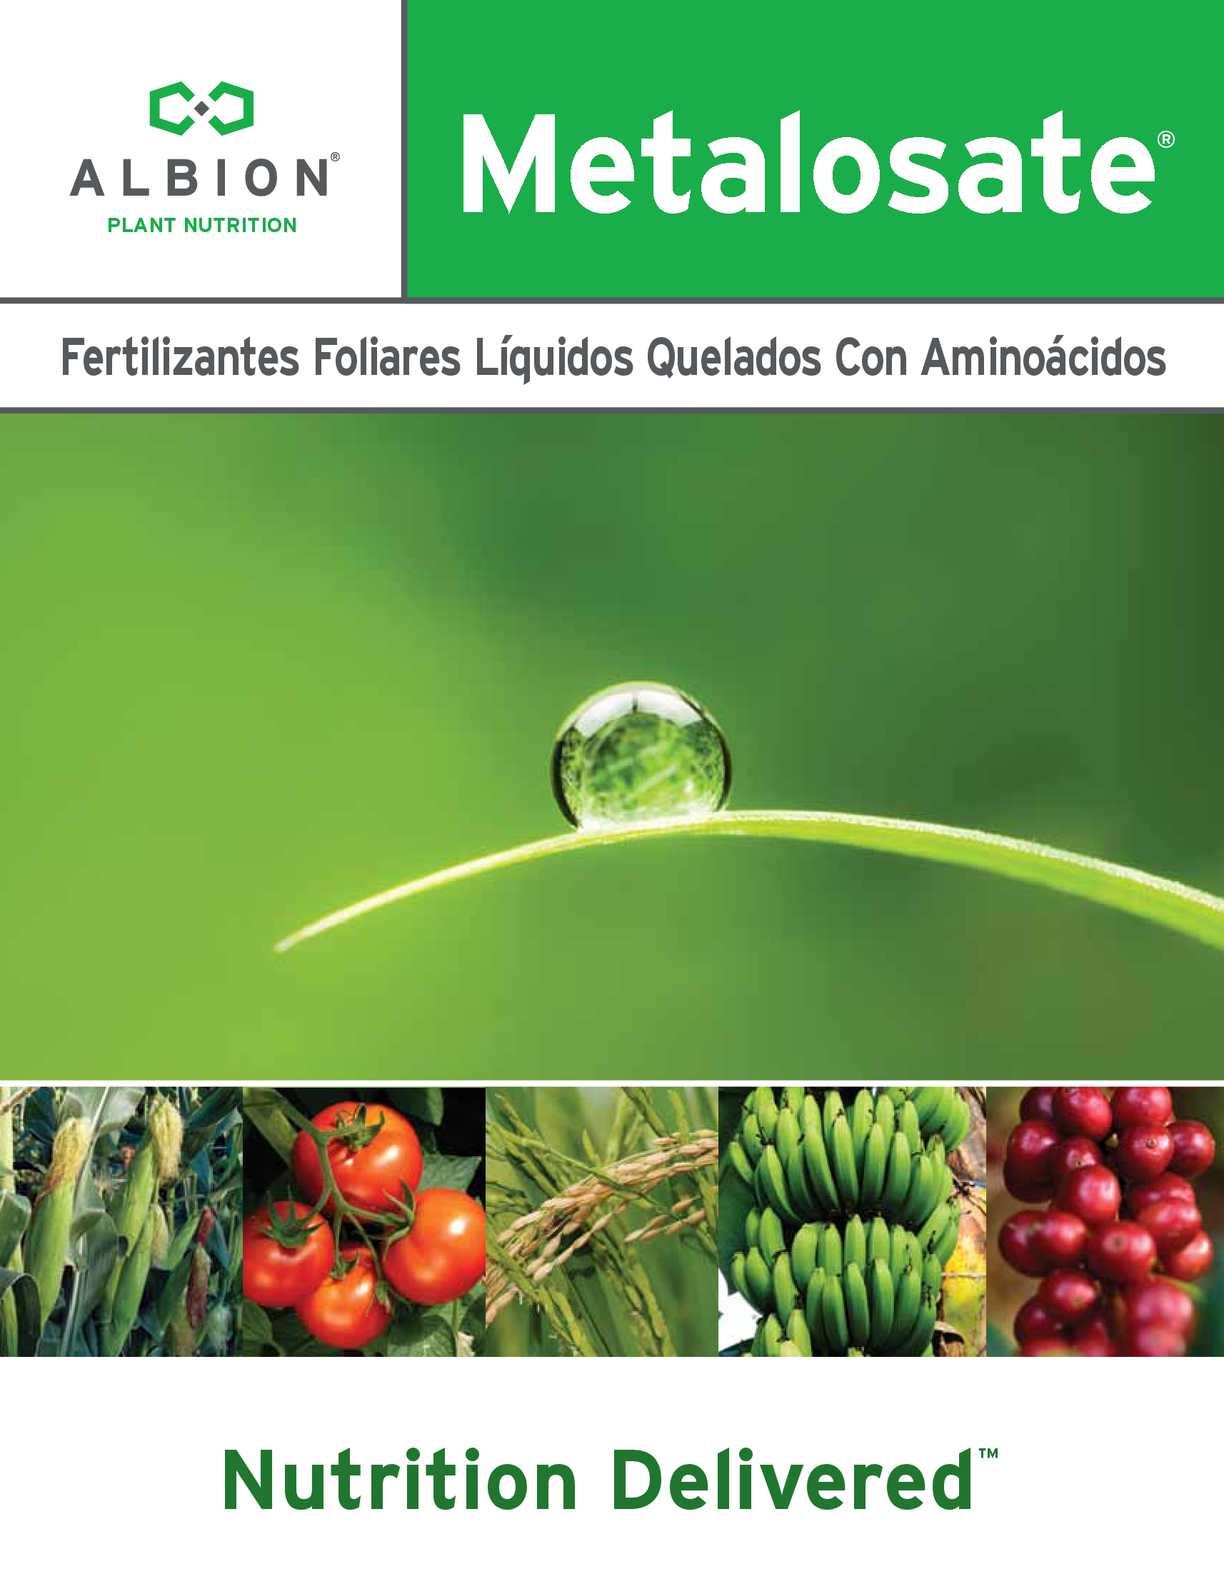 Brochure Metalosate Plant Nutrition 2015